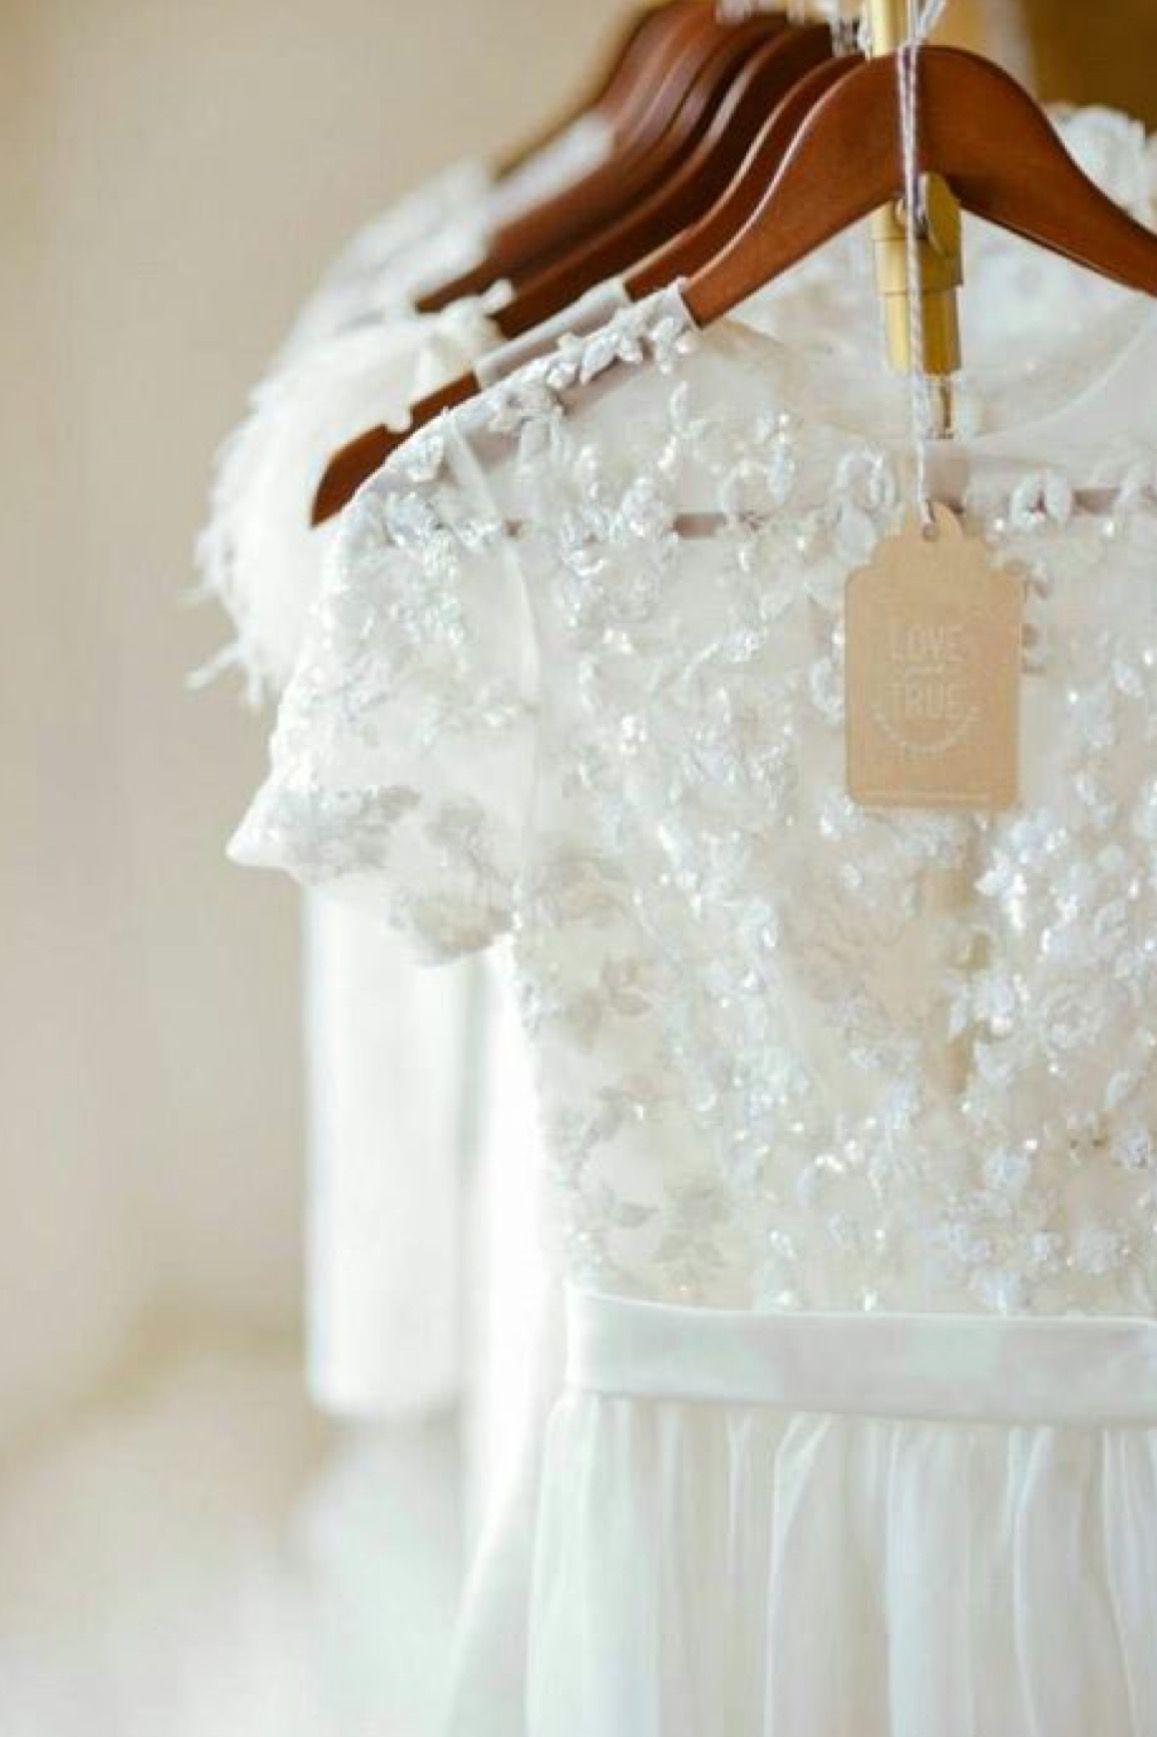 M boutique lace dress  Pin by Chelle M on bellaus bayside BOUTIQUE  Pinterest  Boutique